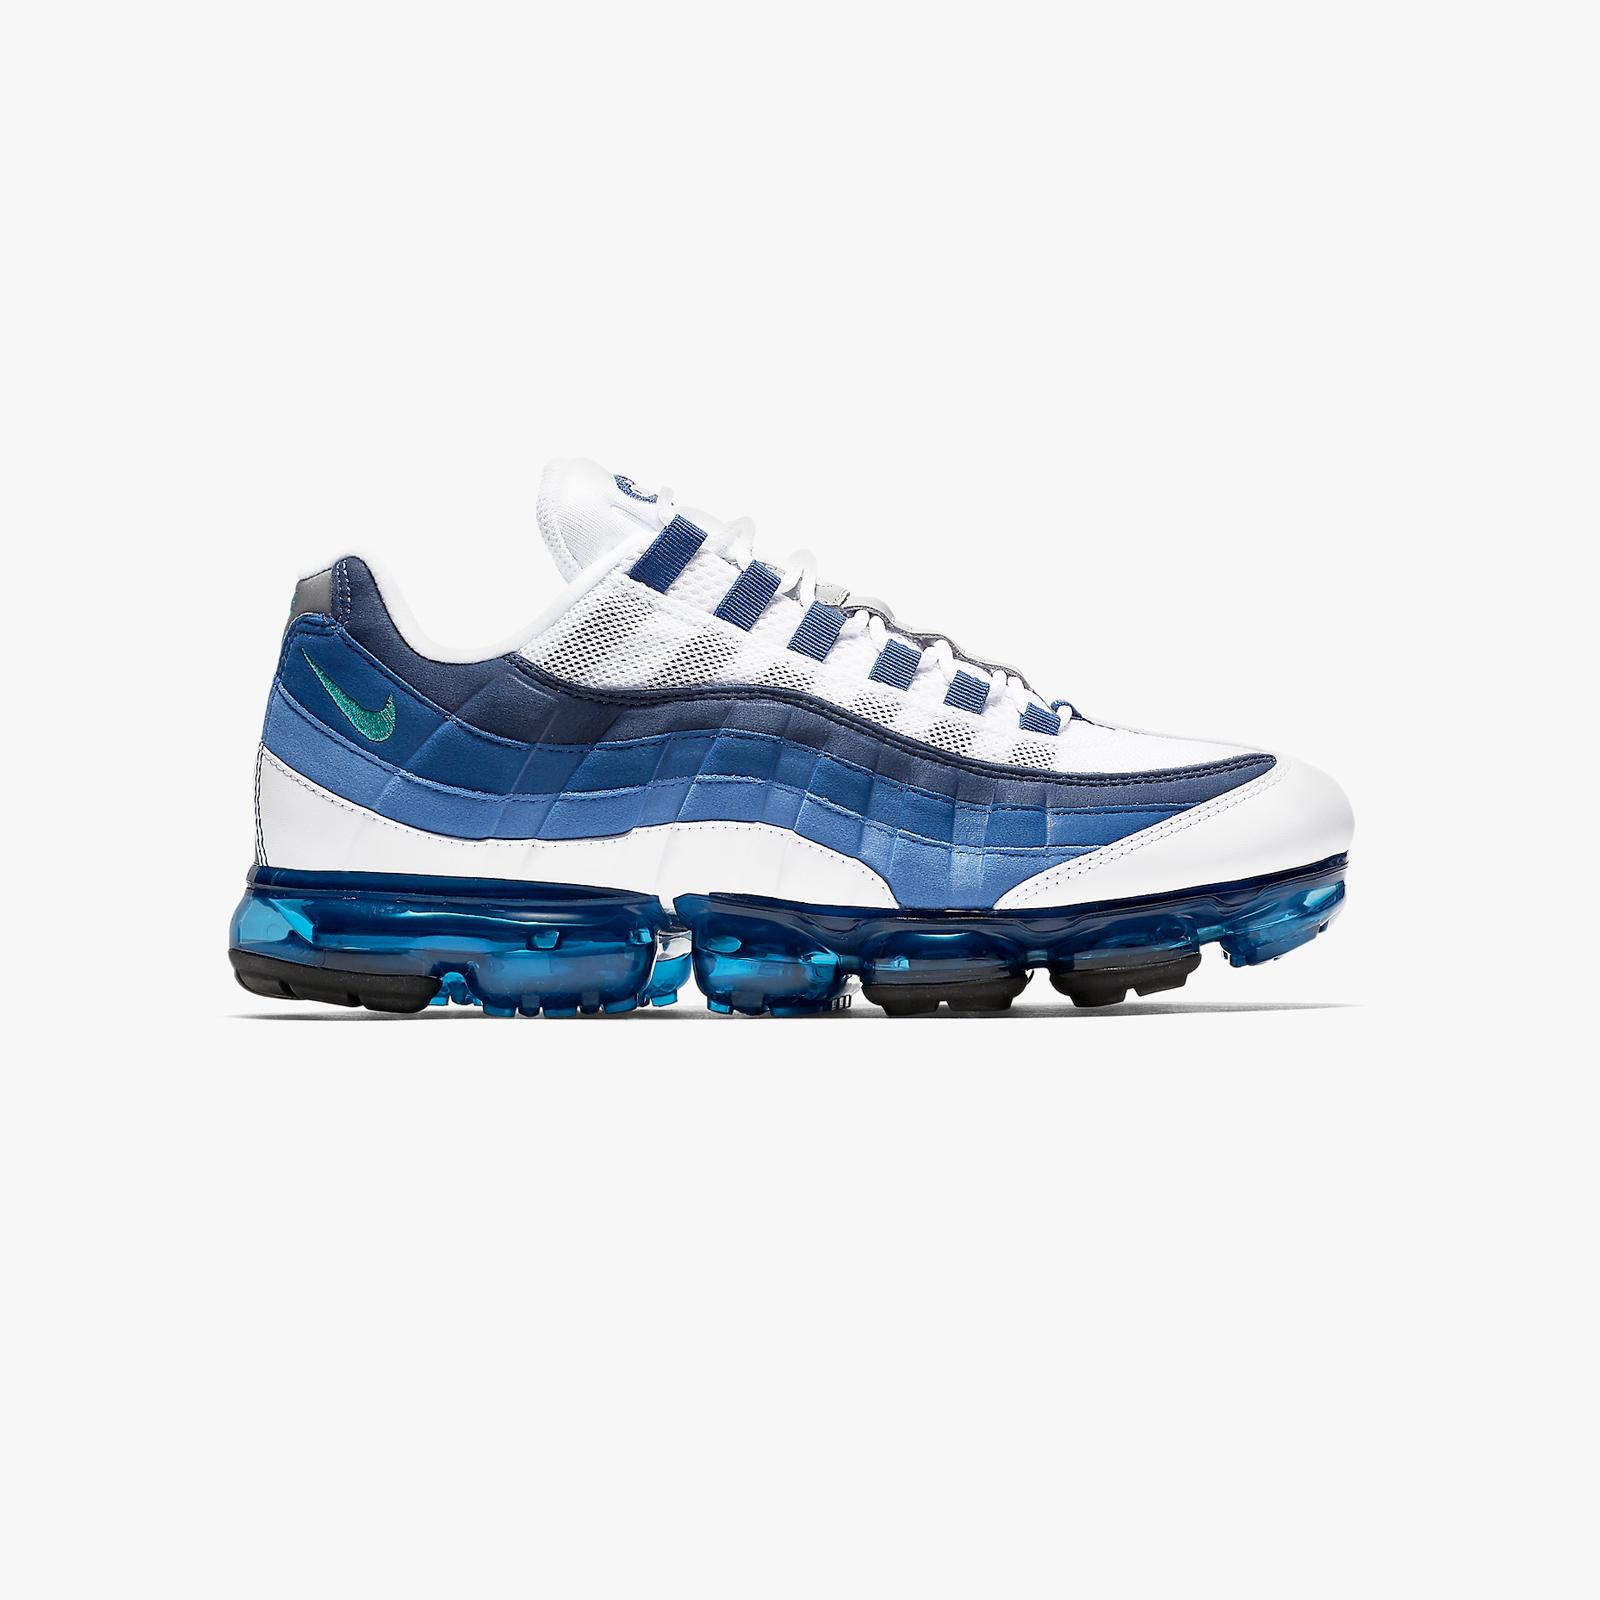 de8aa5d92c Nike Air Vapormax 95 - Aj7292-100 - Sneakersnstuff | sneakers ...